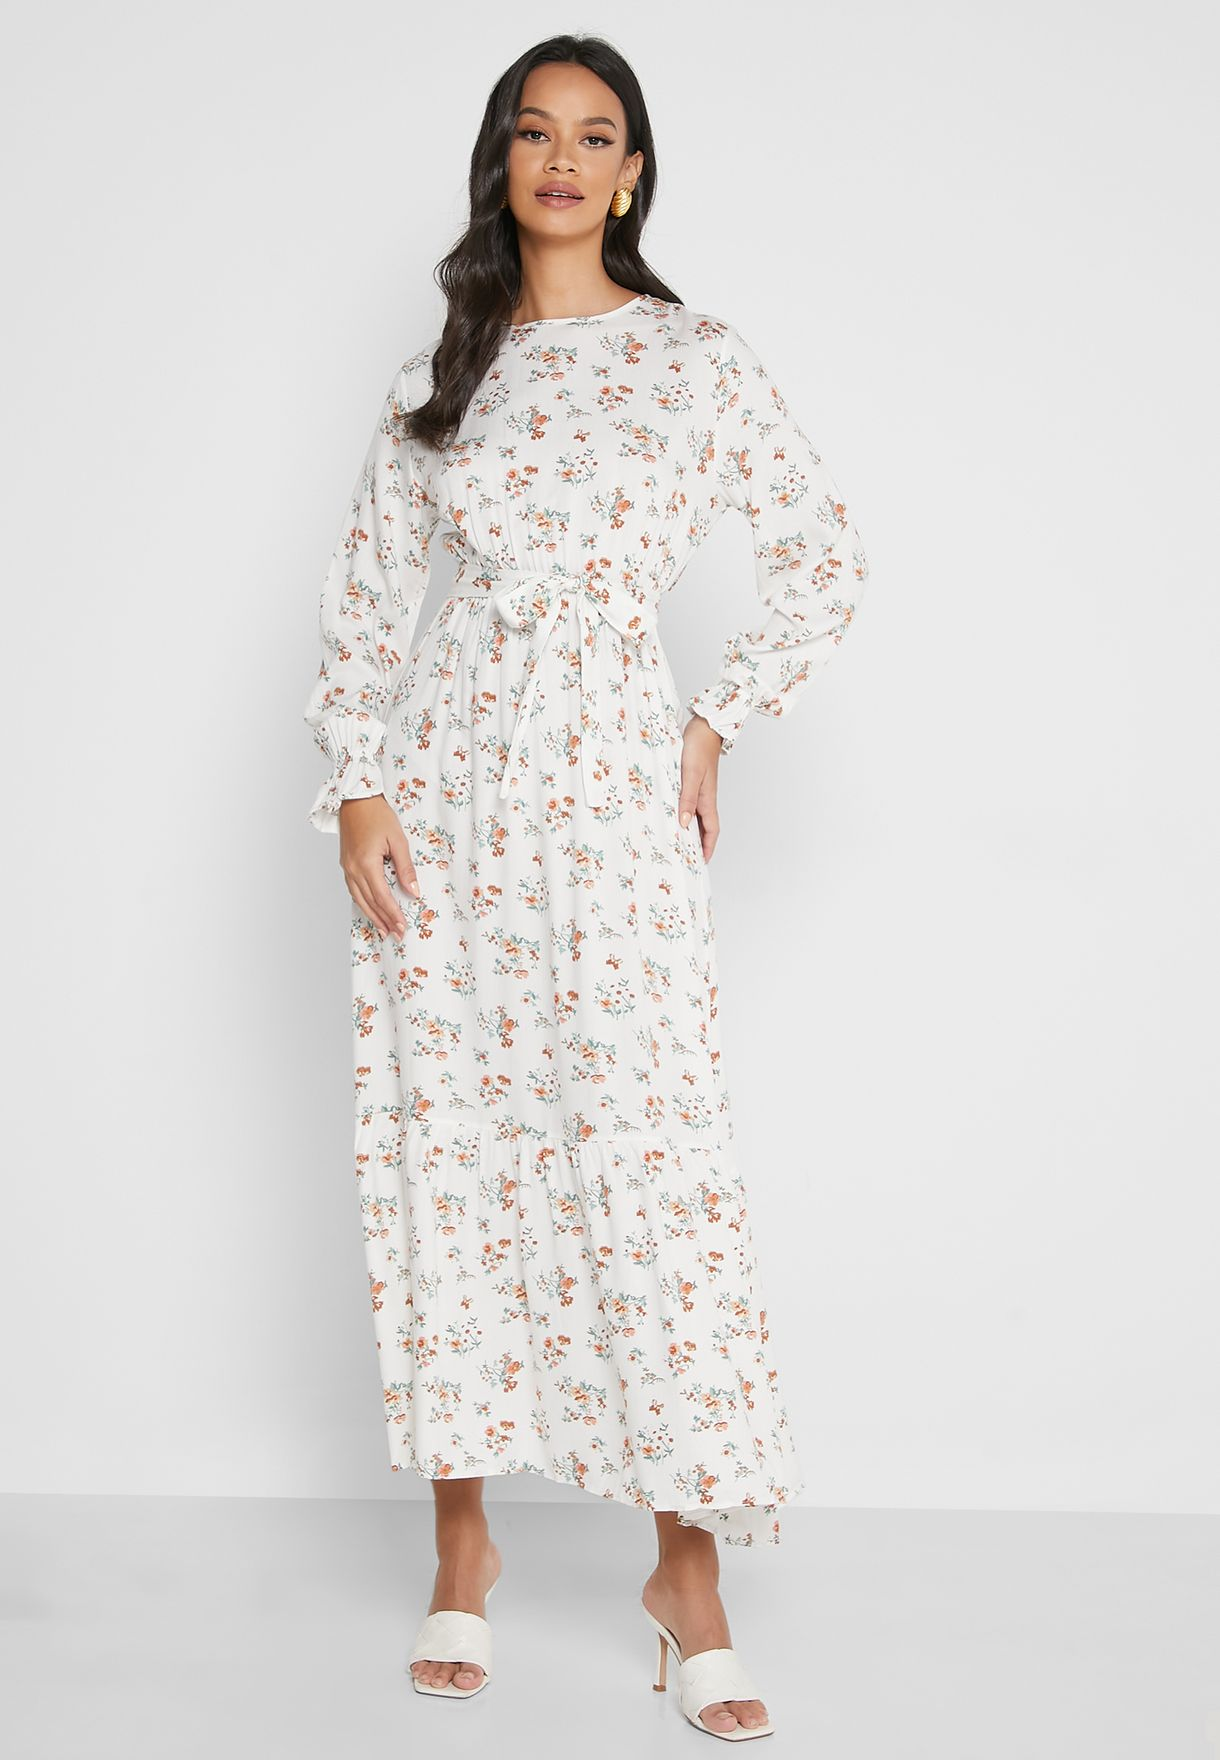 Floral Print Elastic Detail Dress